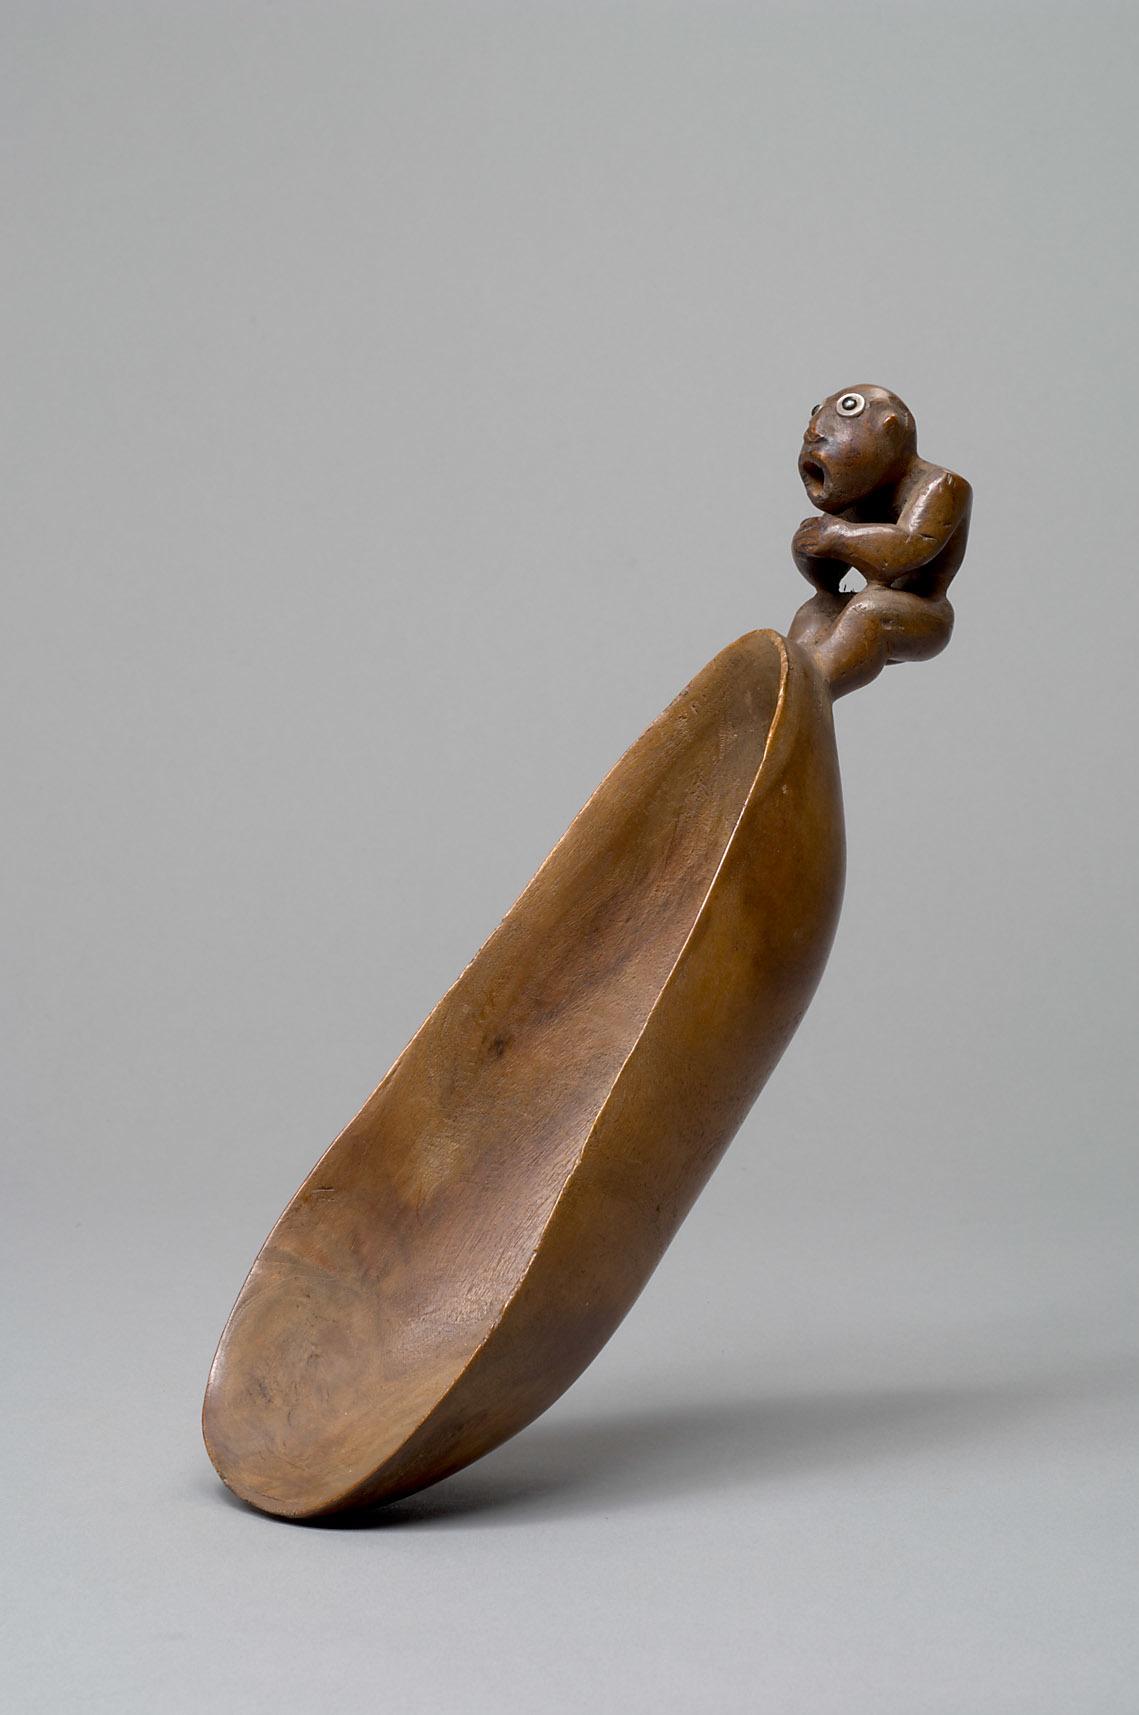 Hawaiian Ladle with Human Figure | 1778 © KHM-Museumsverband